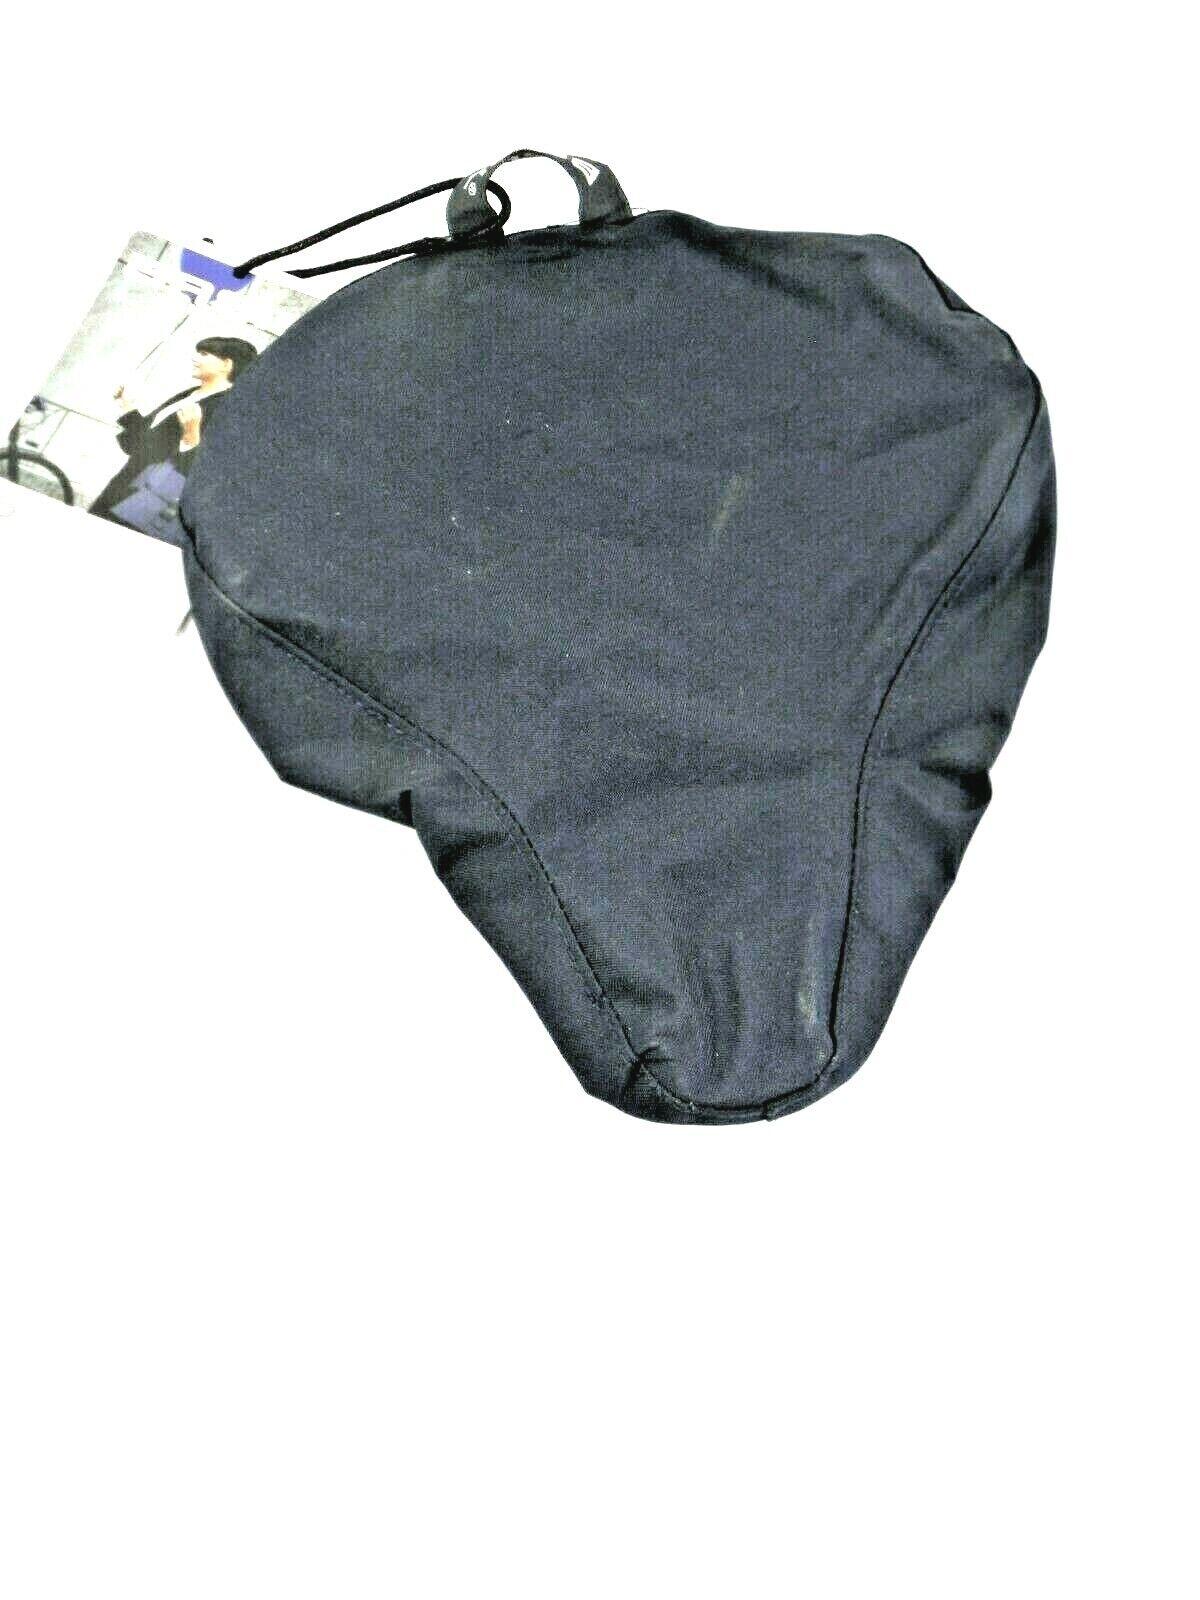 BASIL Go GRAU Sattelbezug Sattelüberzug Wasserabweisend grey saddle cover